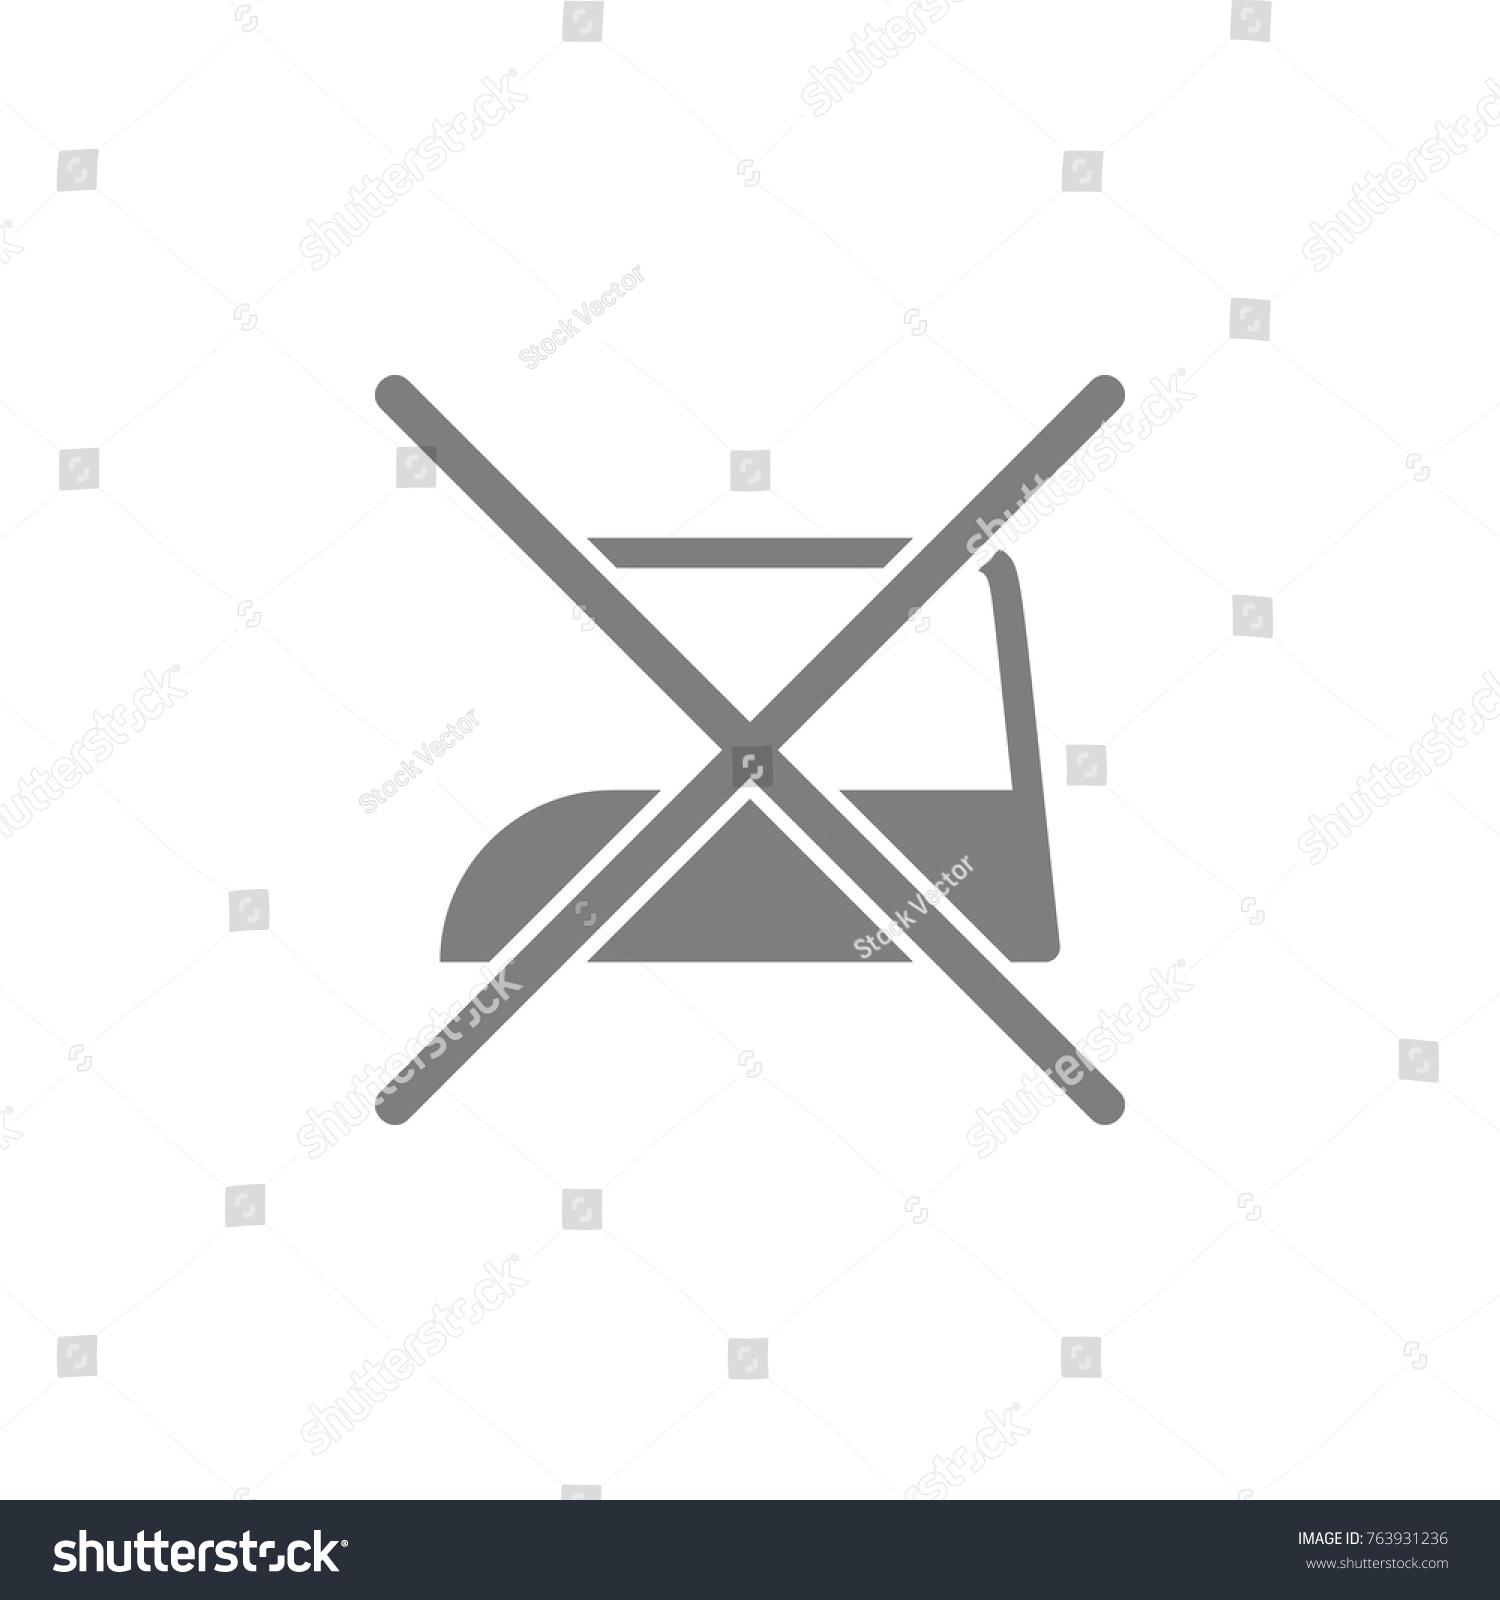 Do Not Iron Web Element Premium Stock Vector 763931236 Shutterstock